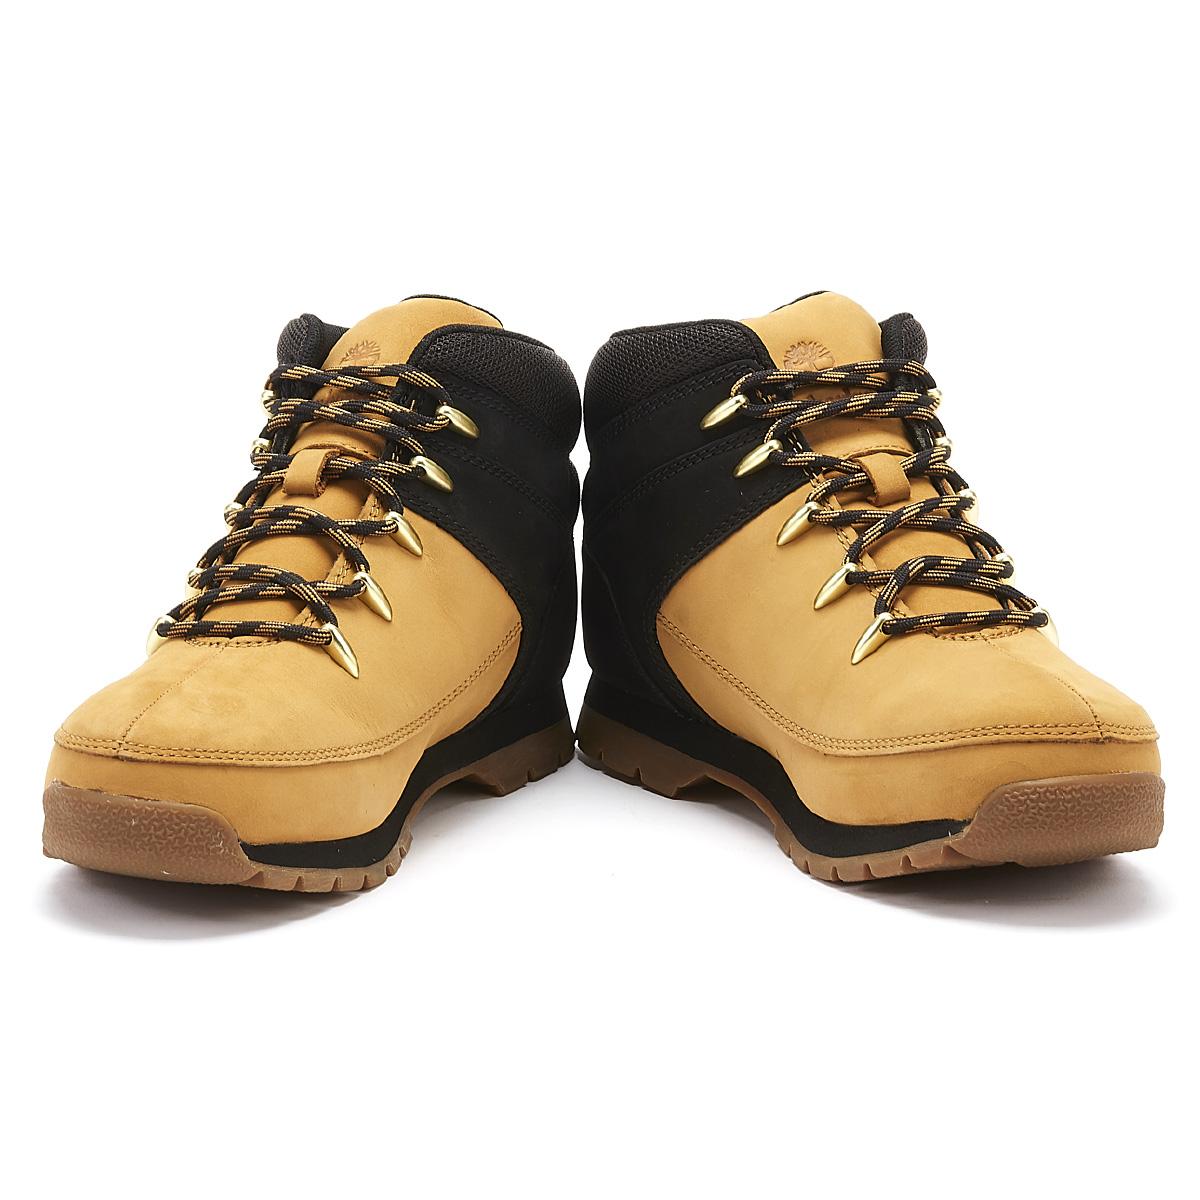 ansiedad patrocinado Para editar  Timberland Euro Sprint Hiker Junior Yellow / Black Boots Winter Shoes | eBay